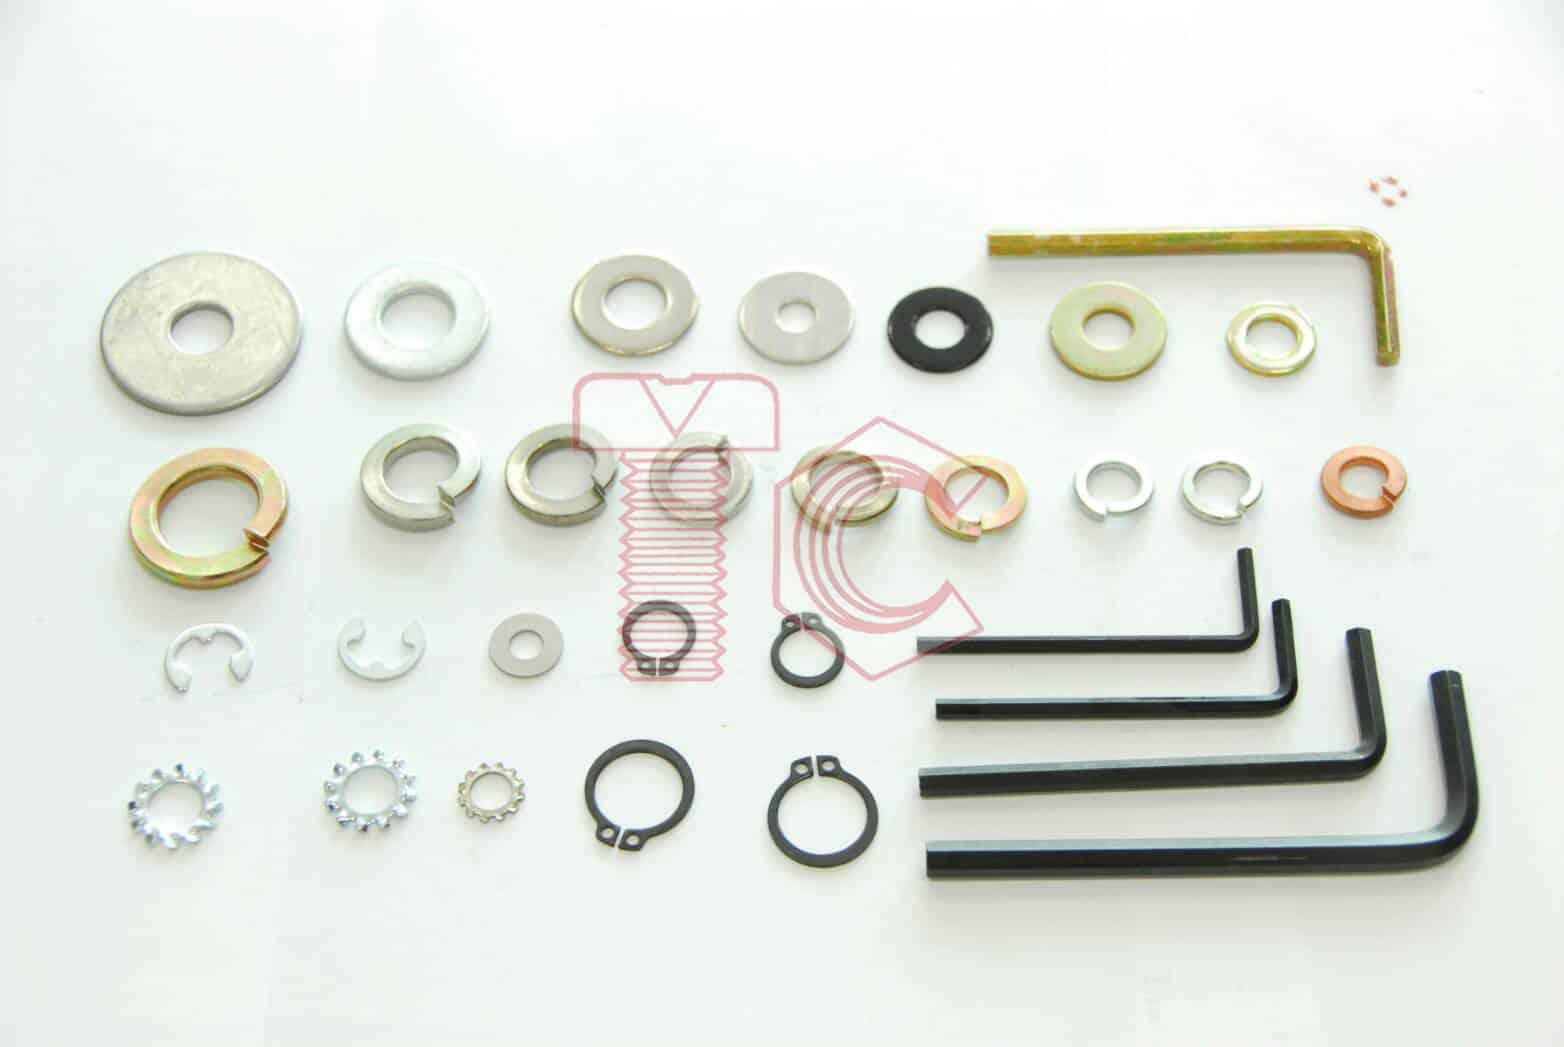 Washer - แหวน , ประแจ L